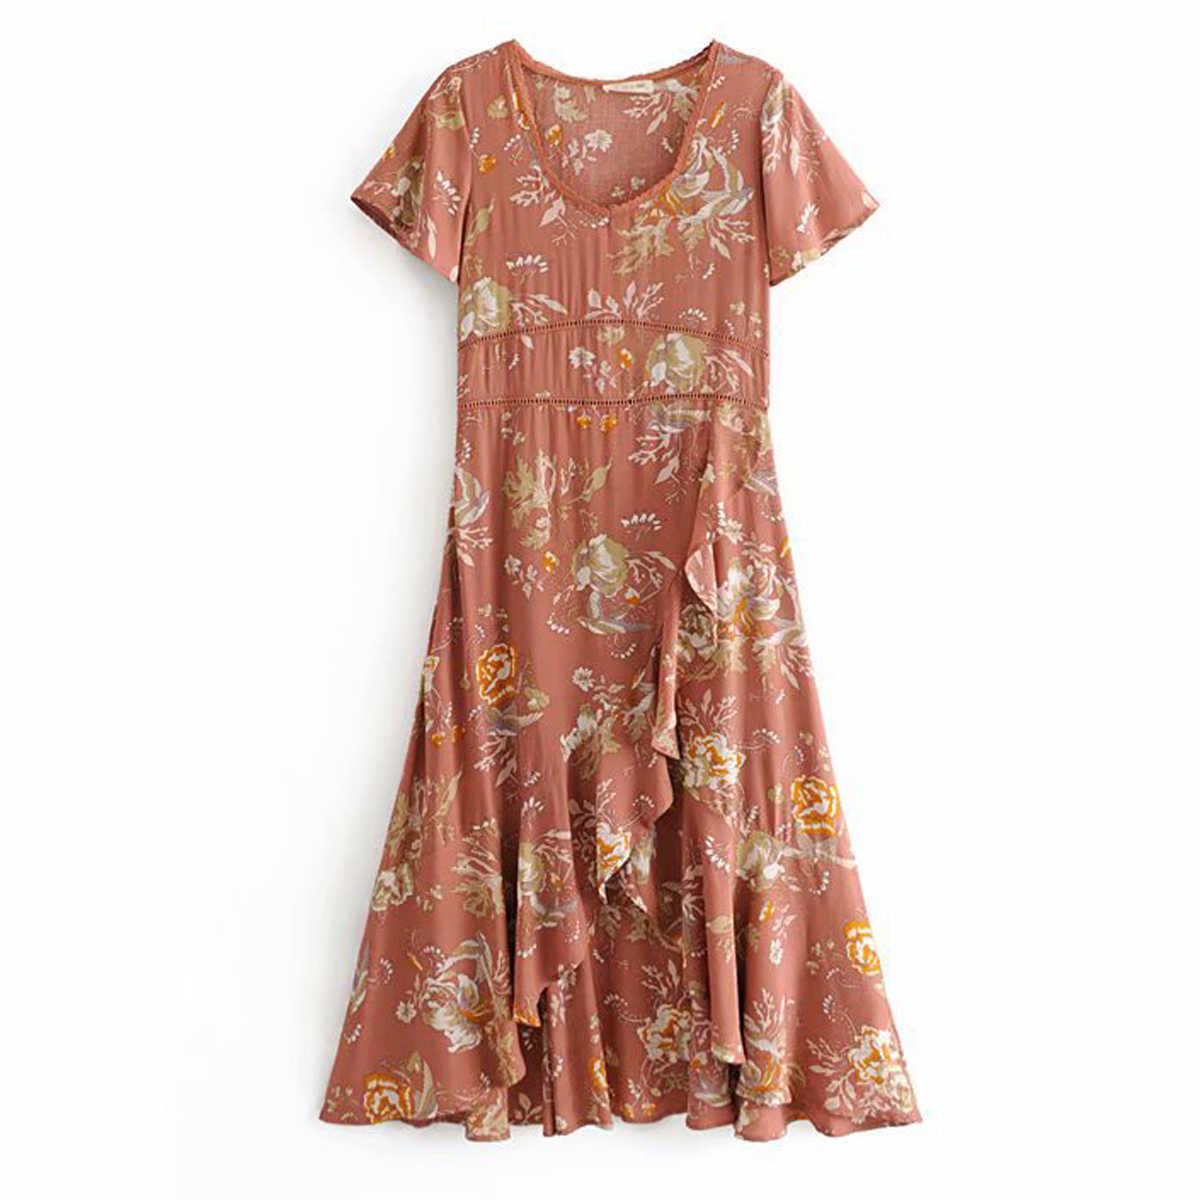 1d485b100e8 ... Jastie Rose Garden Party dress Lace V-Neck Flutter Sleeve Summer Dresses  Boho Chic Asymmetrical